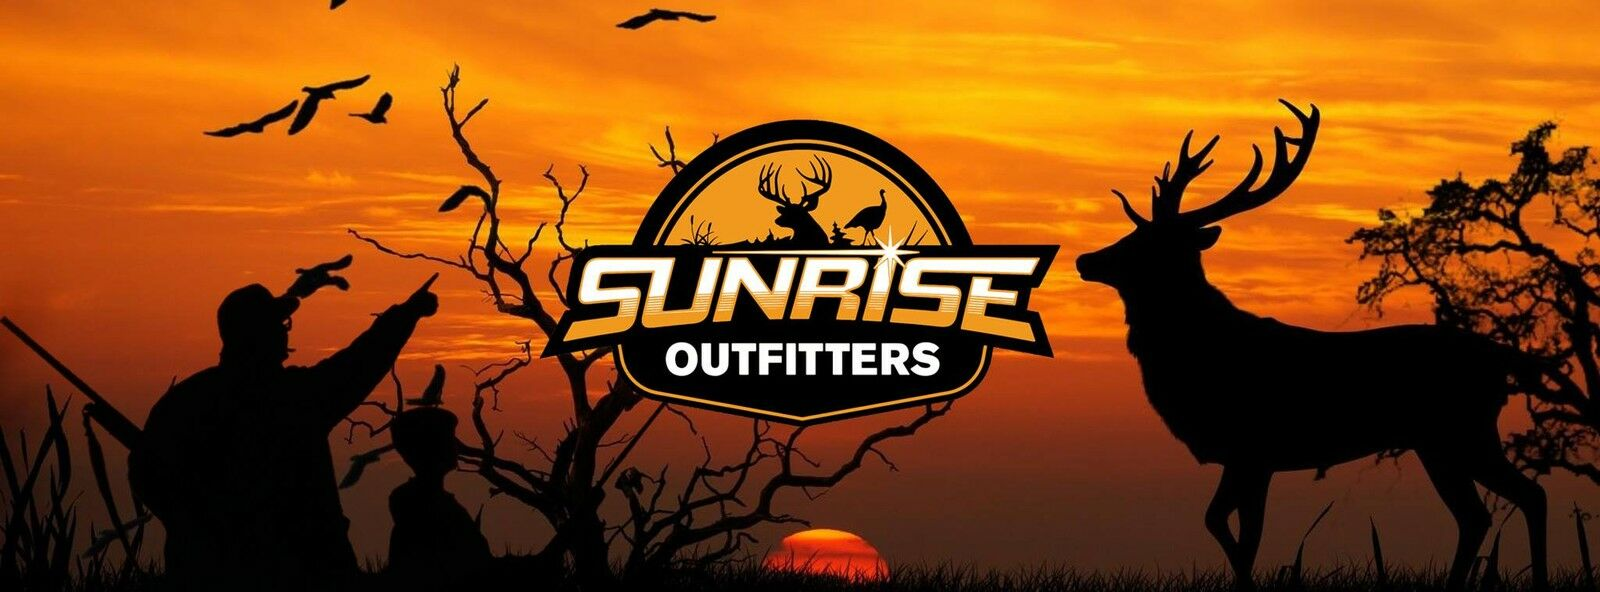 sunriseoutfitters1